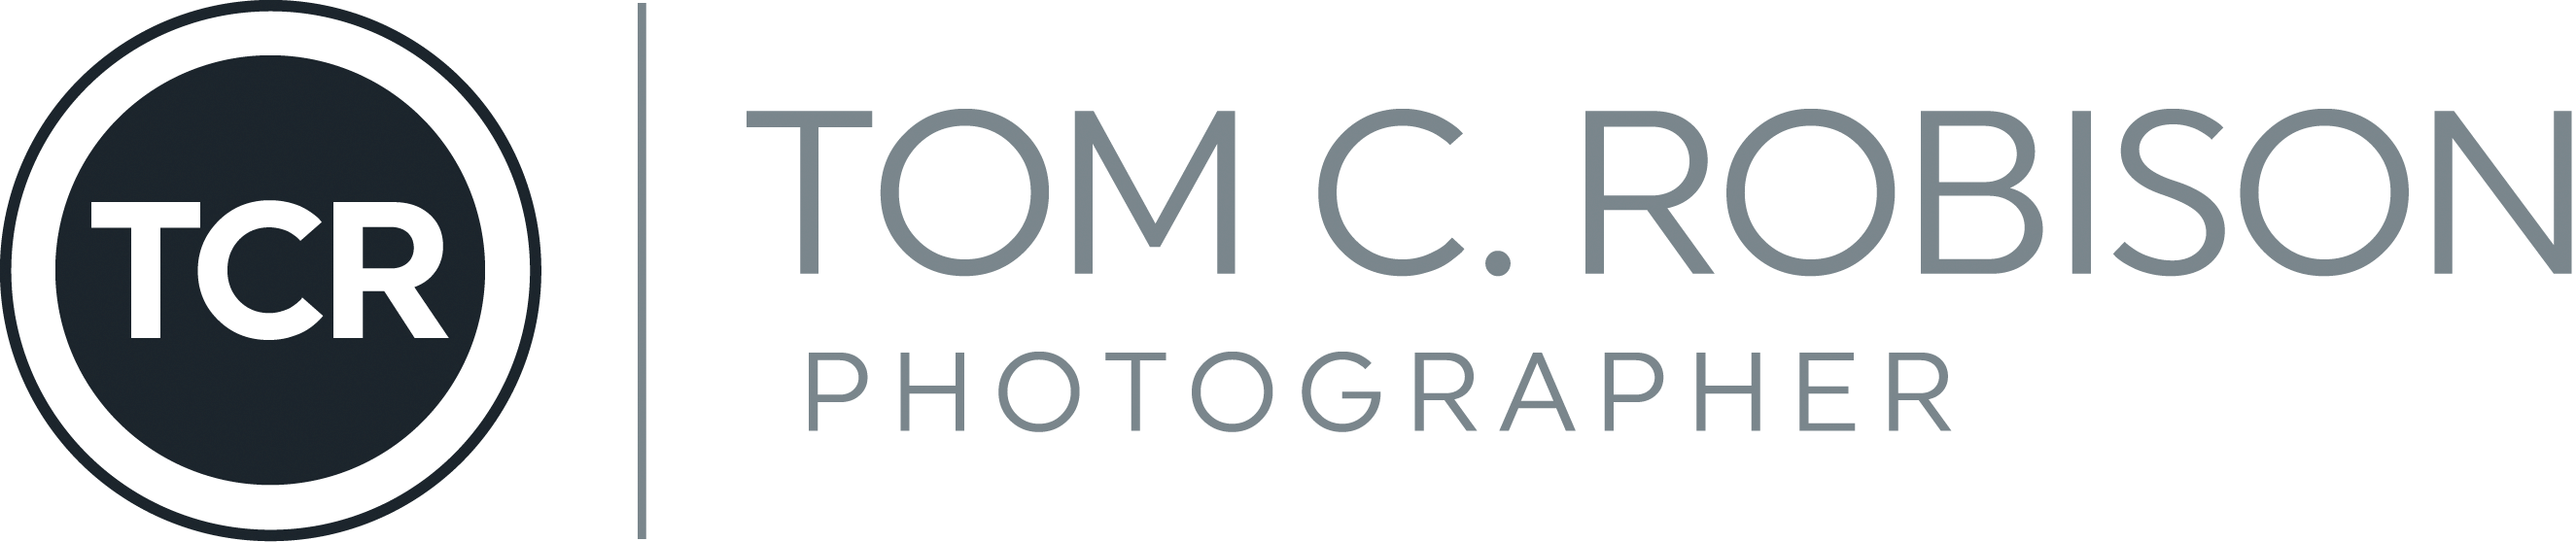 Tom C. Robison  Photographer